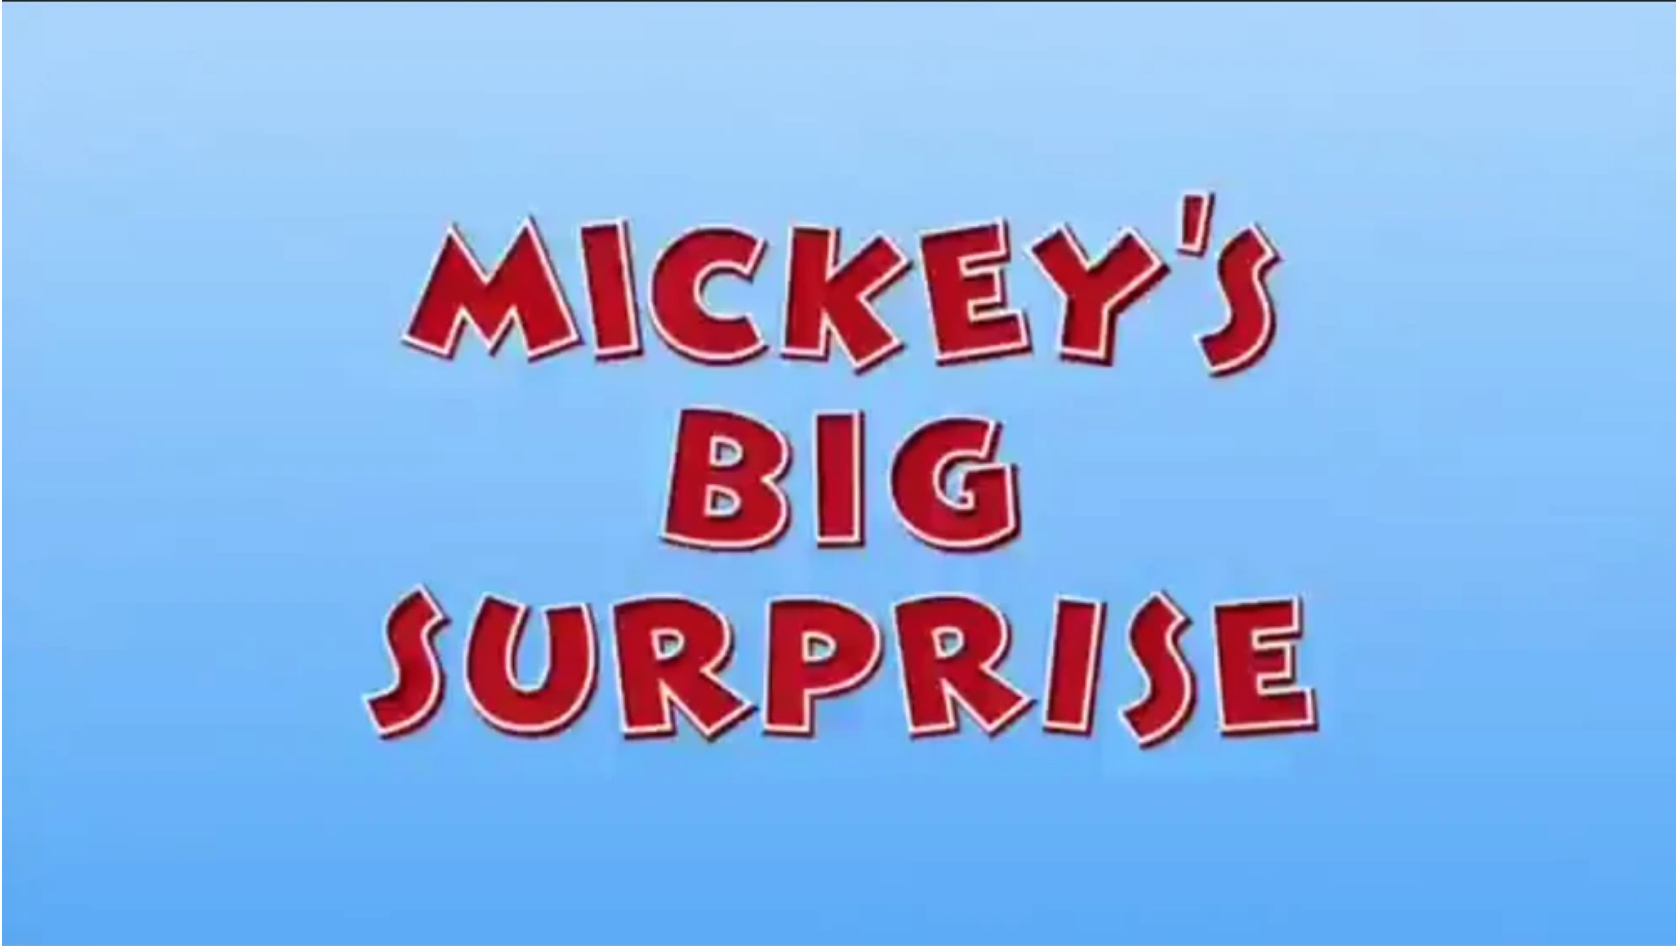 Mickey's Big Surprise